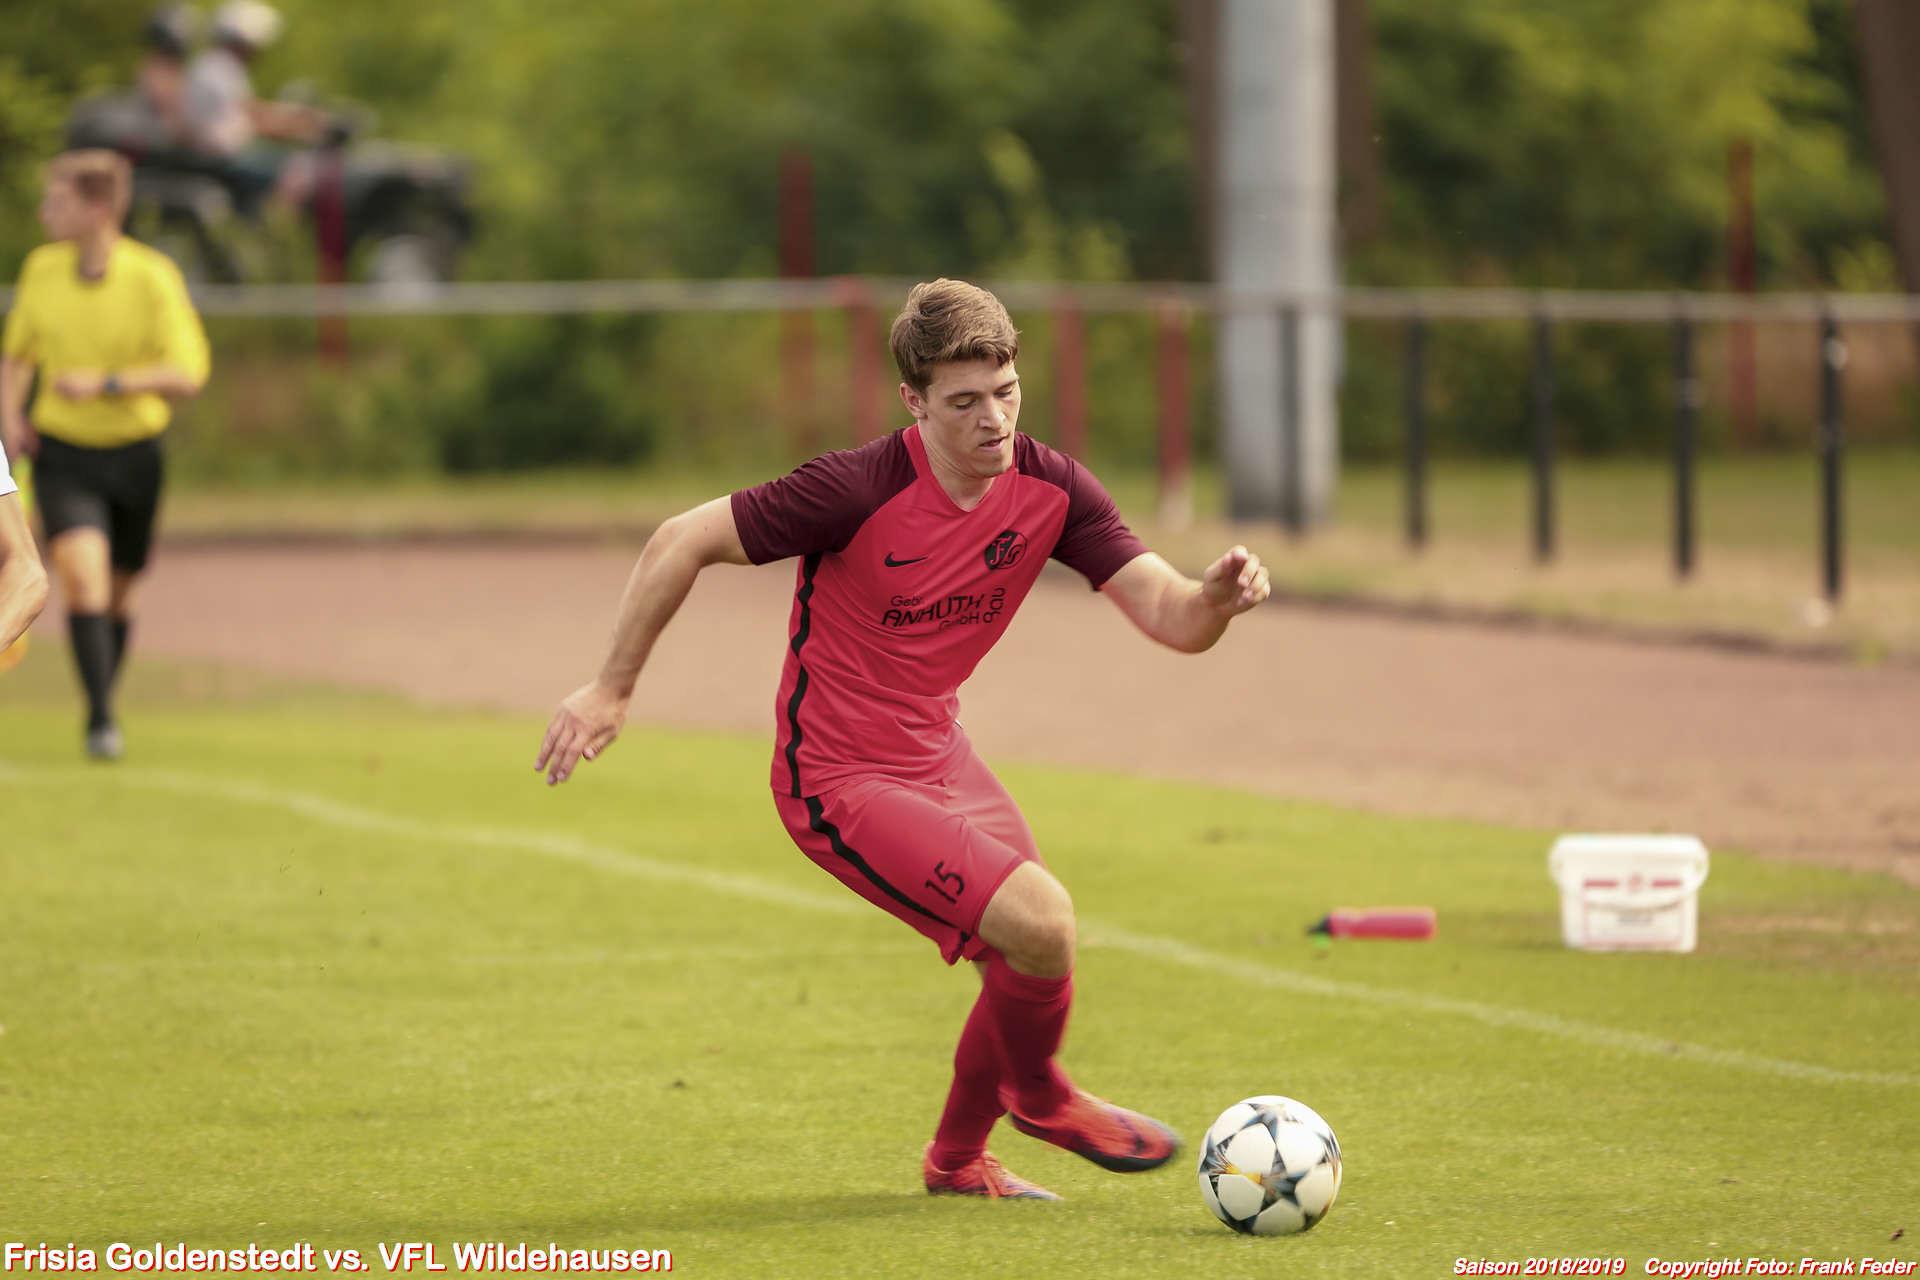 WEB_I Herren Frisia vs Wildeshausen Bezirkspokal 2018_2019 180812079.jpg